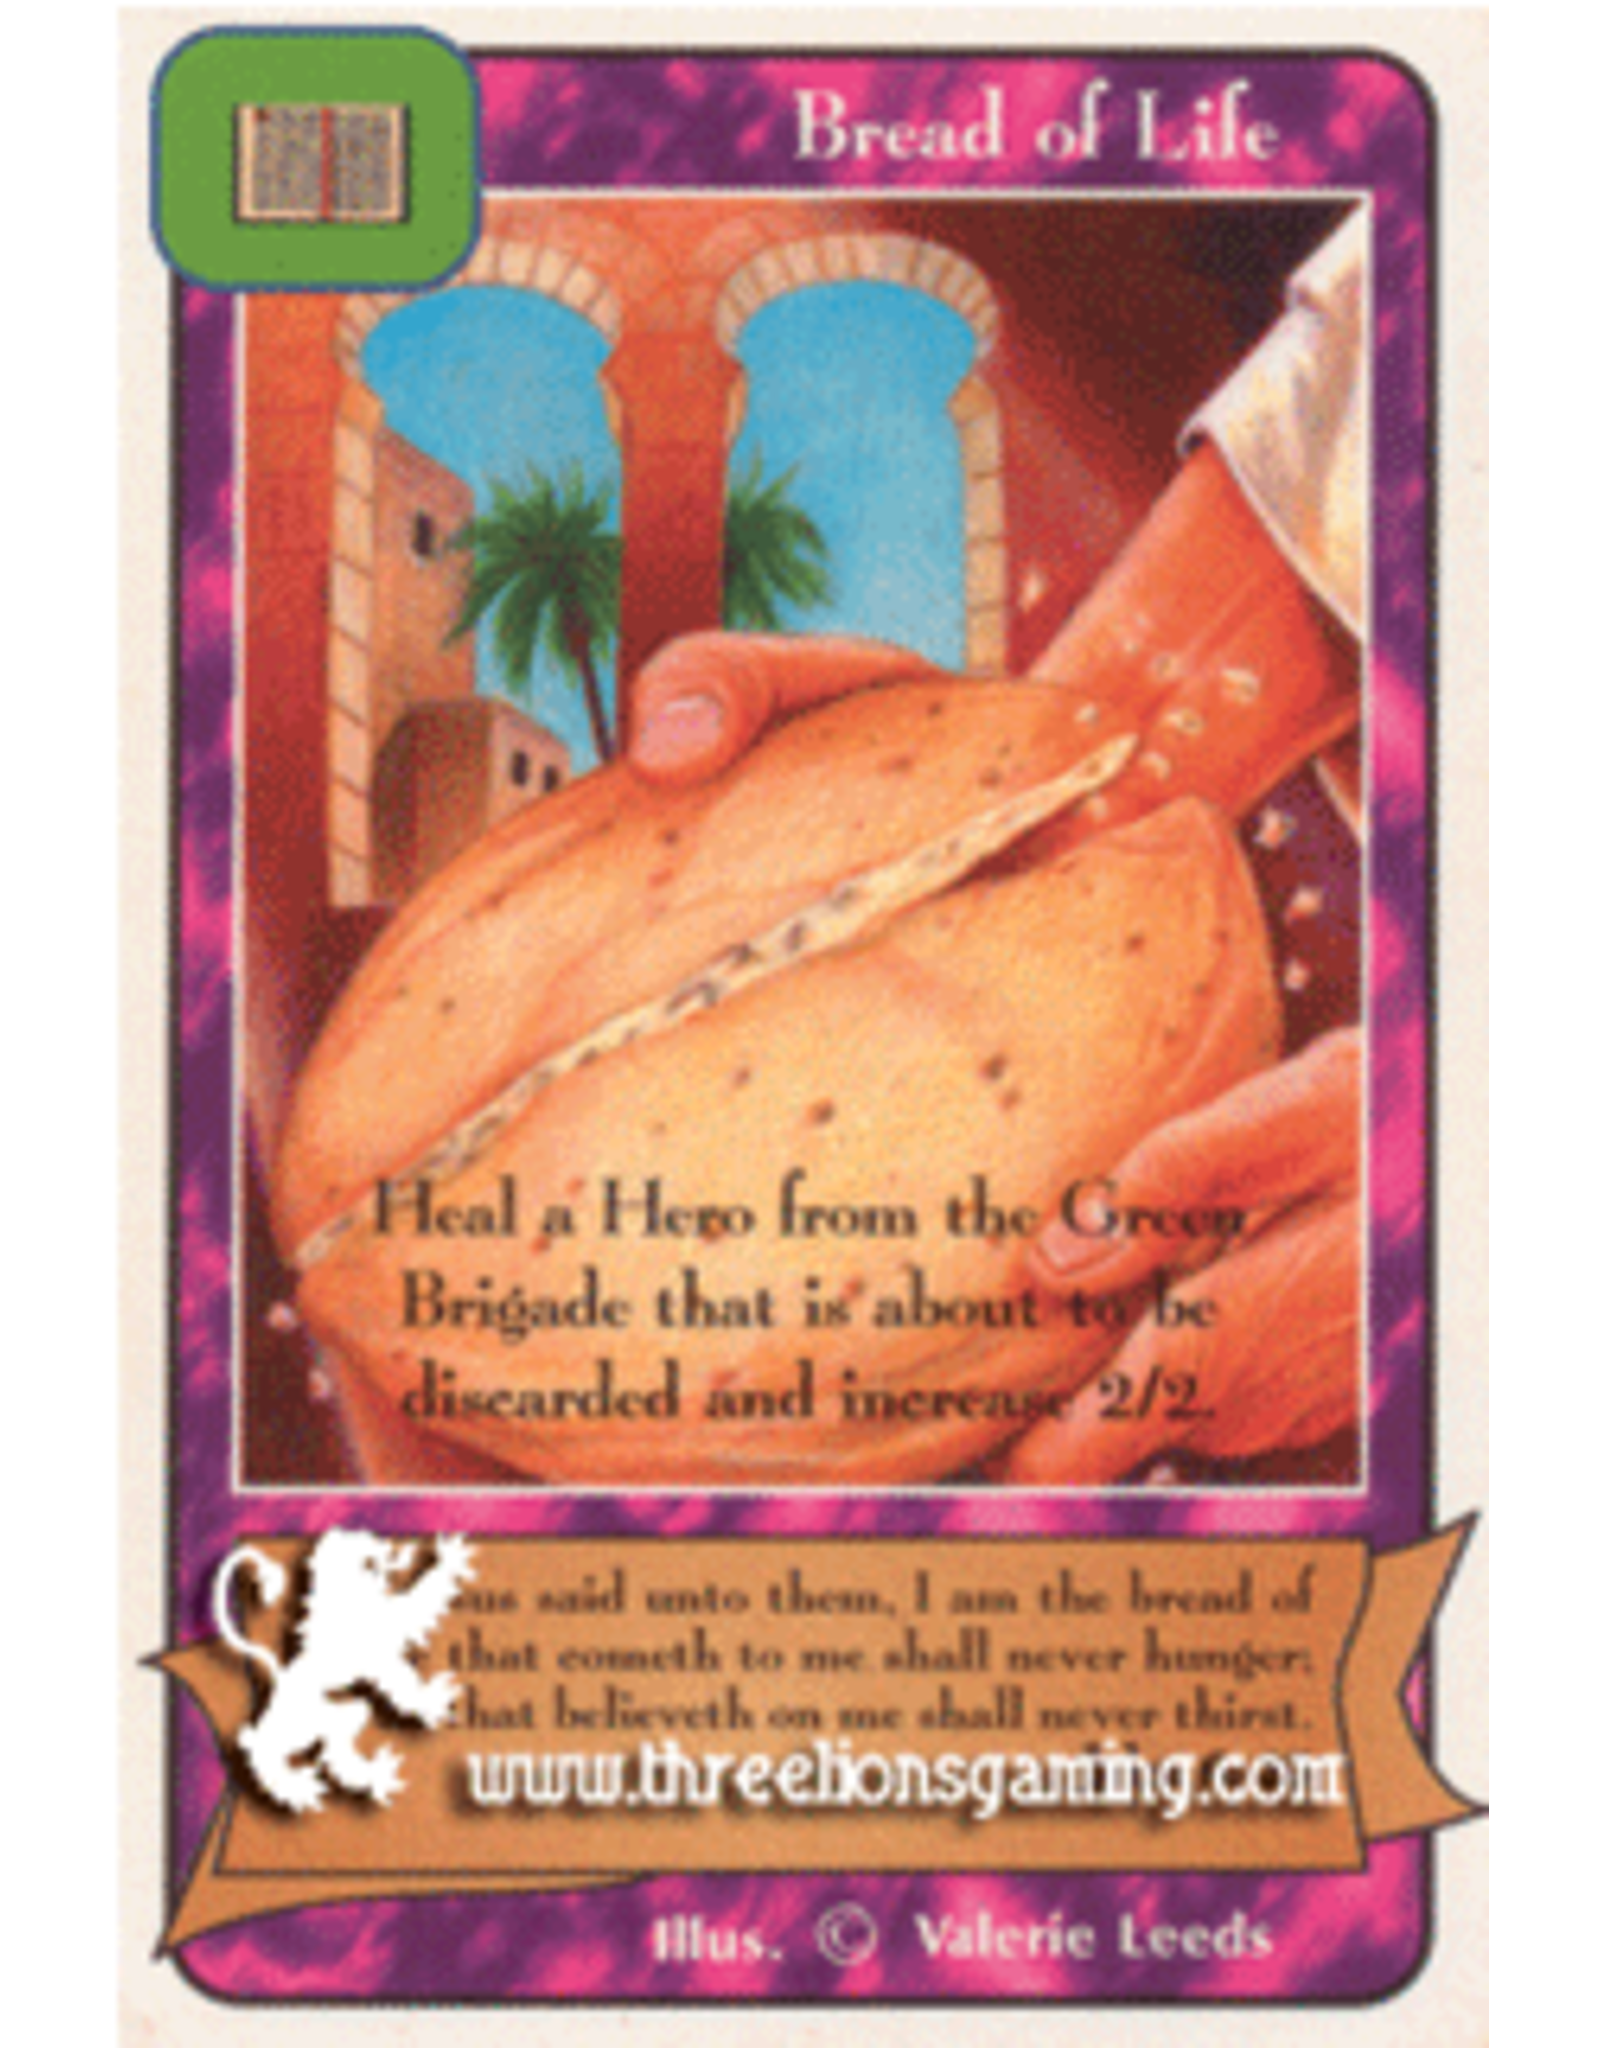 Orig: Bread of Life